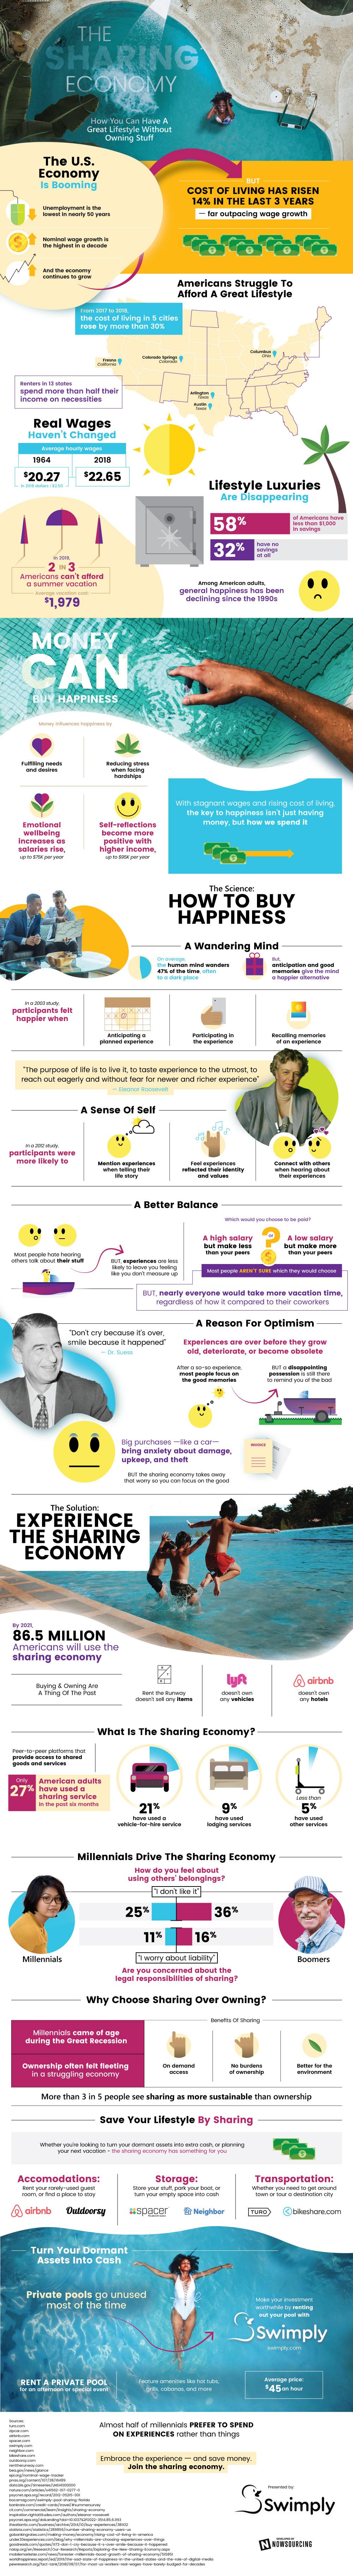 The Sharing Economy - Infographic